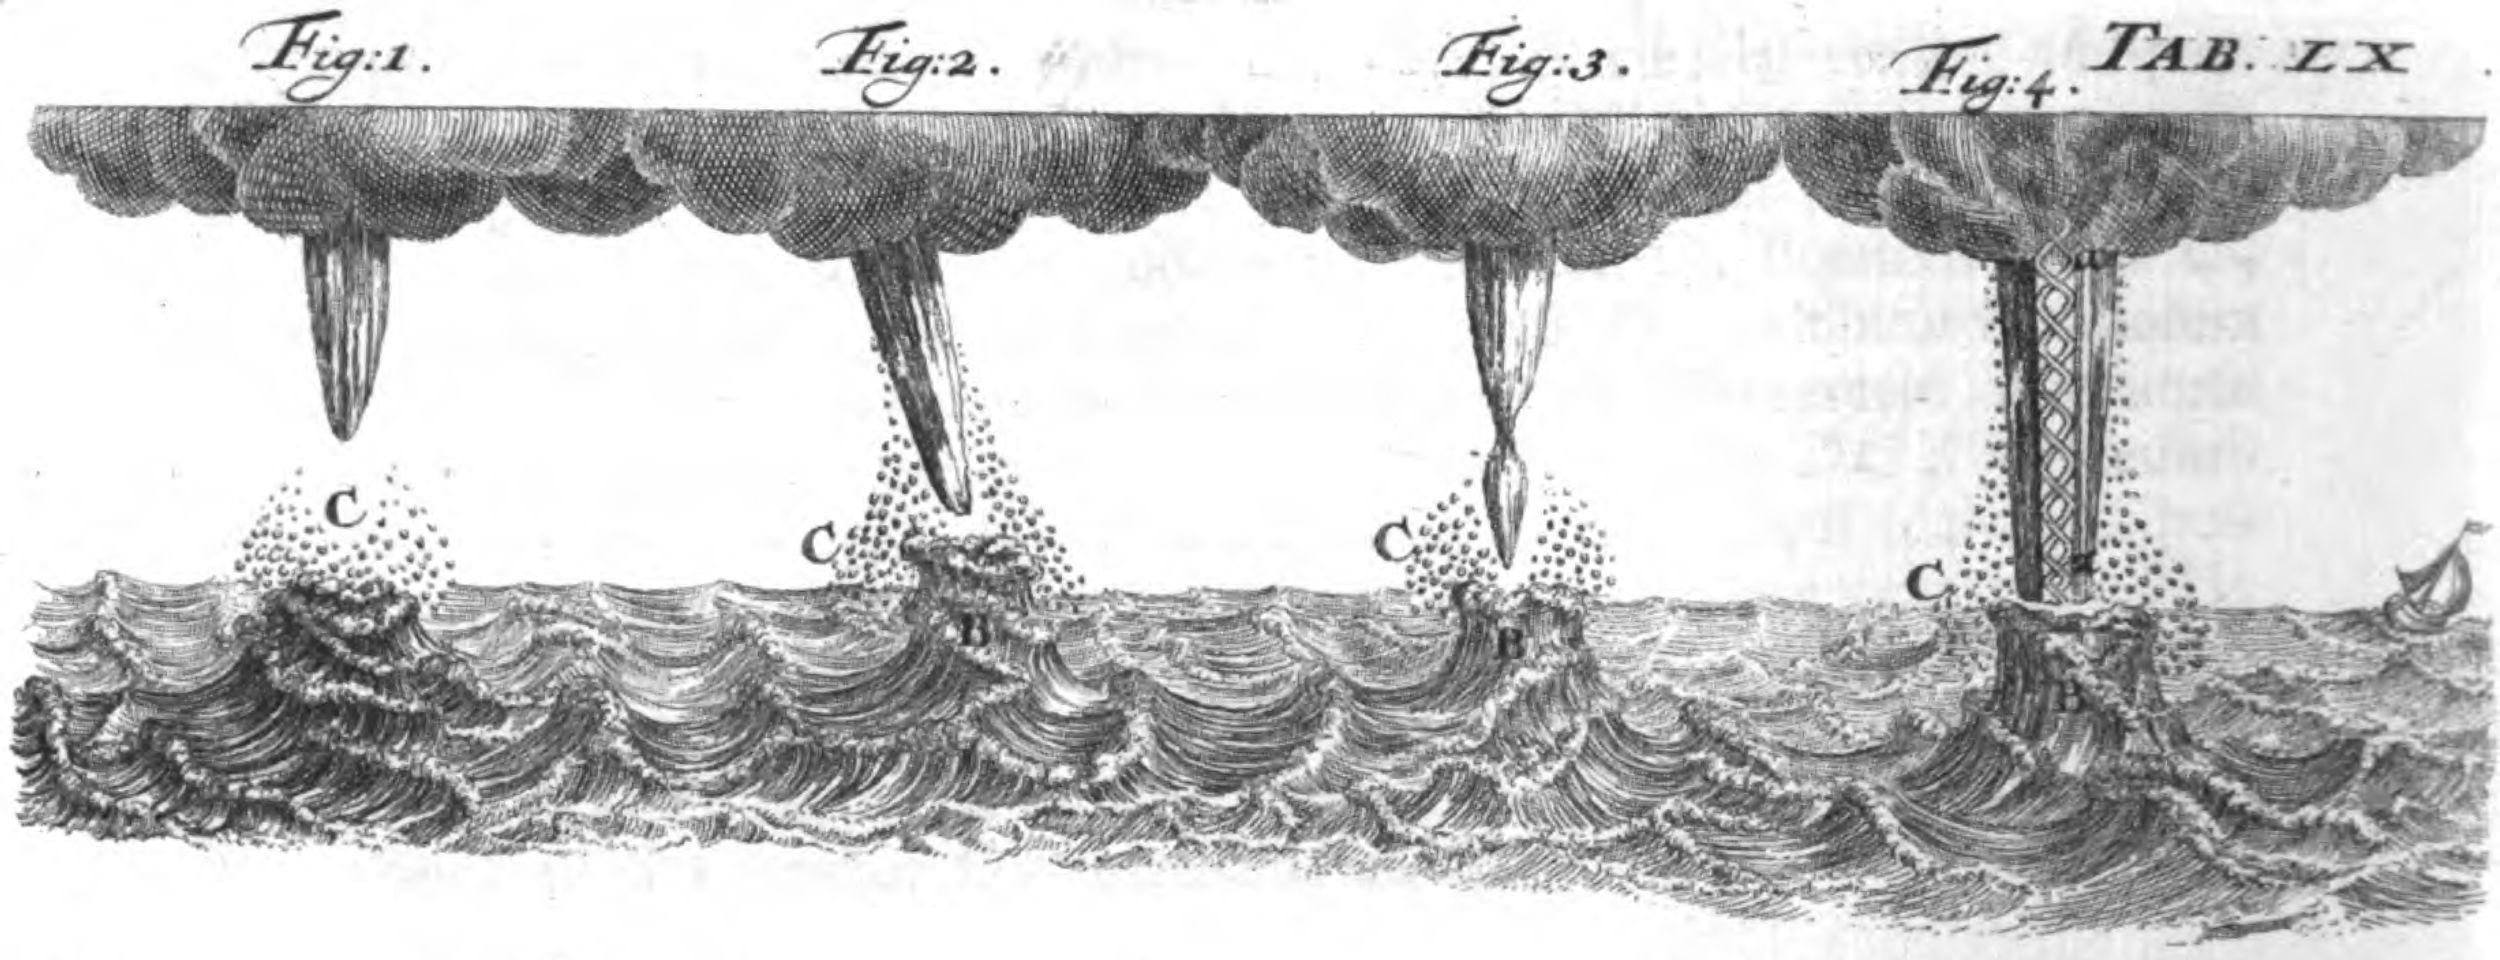 Detail showing the upper part of Plate XL from van Musschenbroek   (1762).   source:  van Musschenbroek, P.,  1762:    Introductio ad Philosophiam Naturalem  , vol. II, Lugduni Batavorum, Apud Sam. et Joh. Luchtmans, pp. 655.  via  Google Books